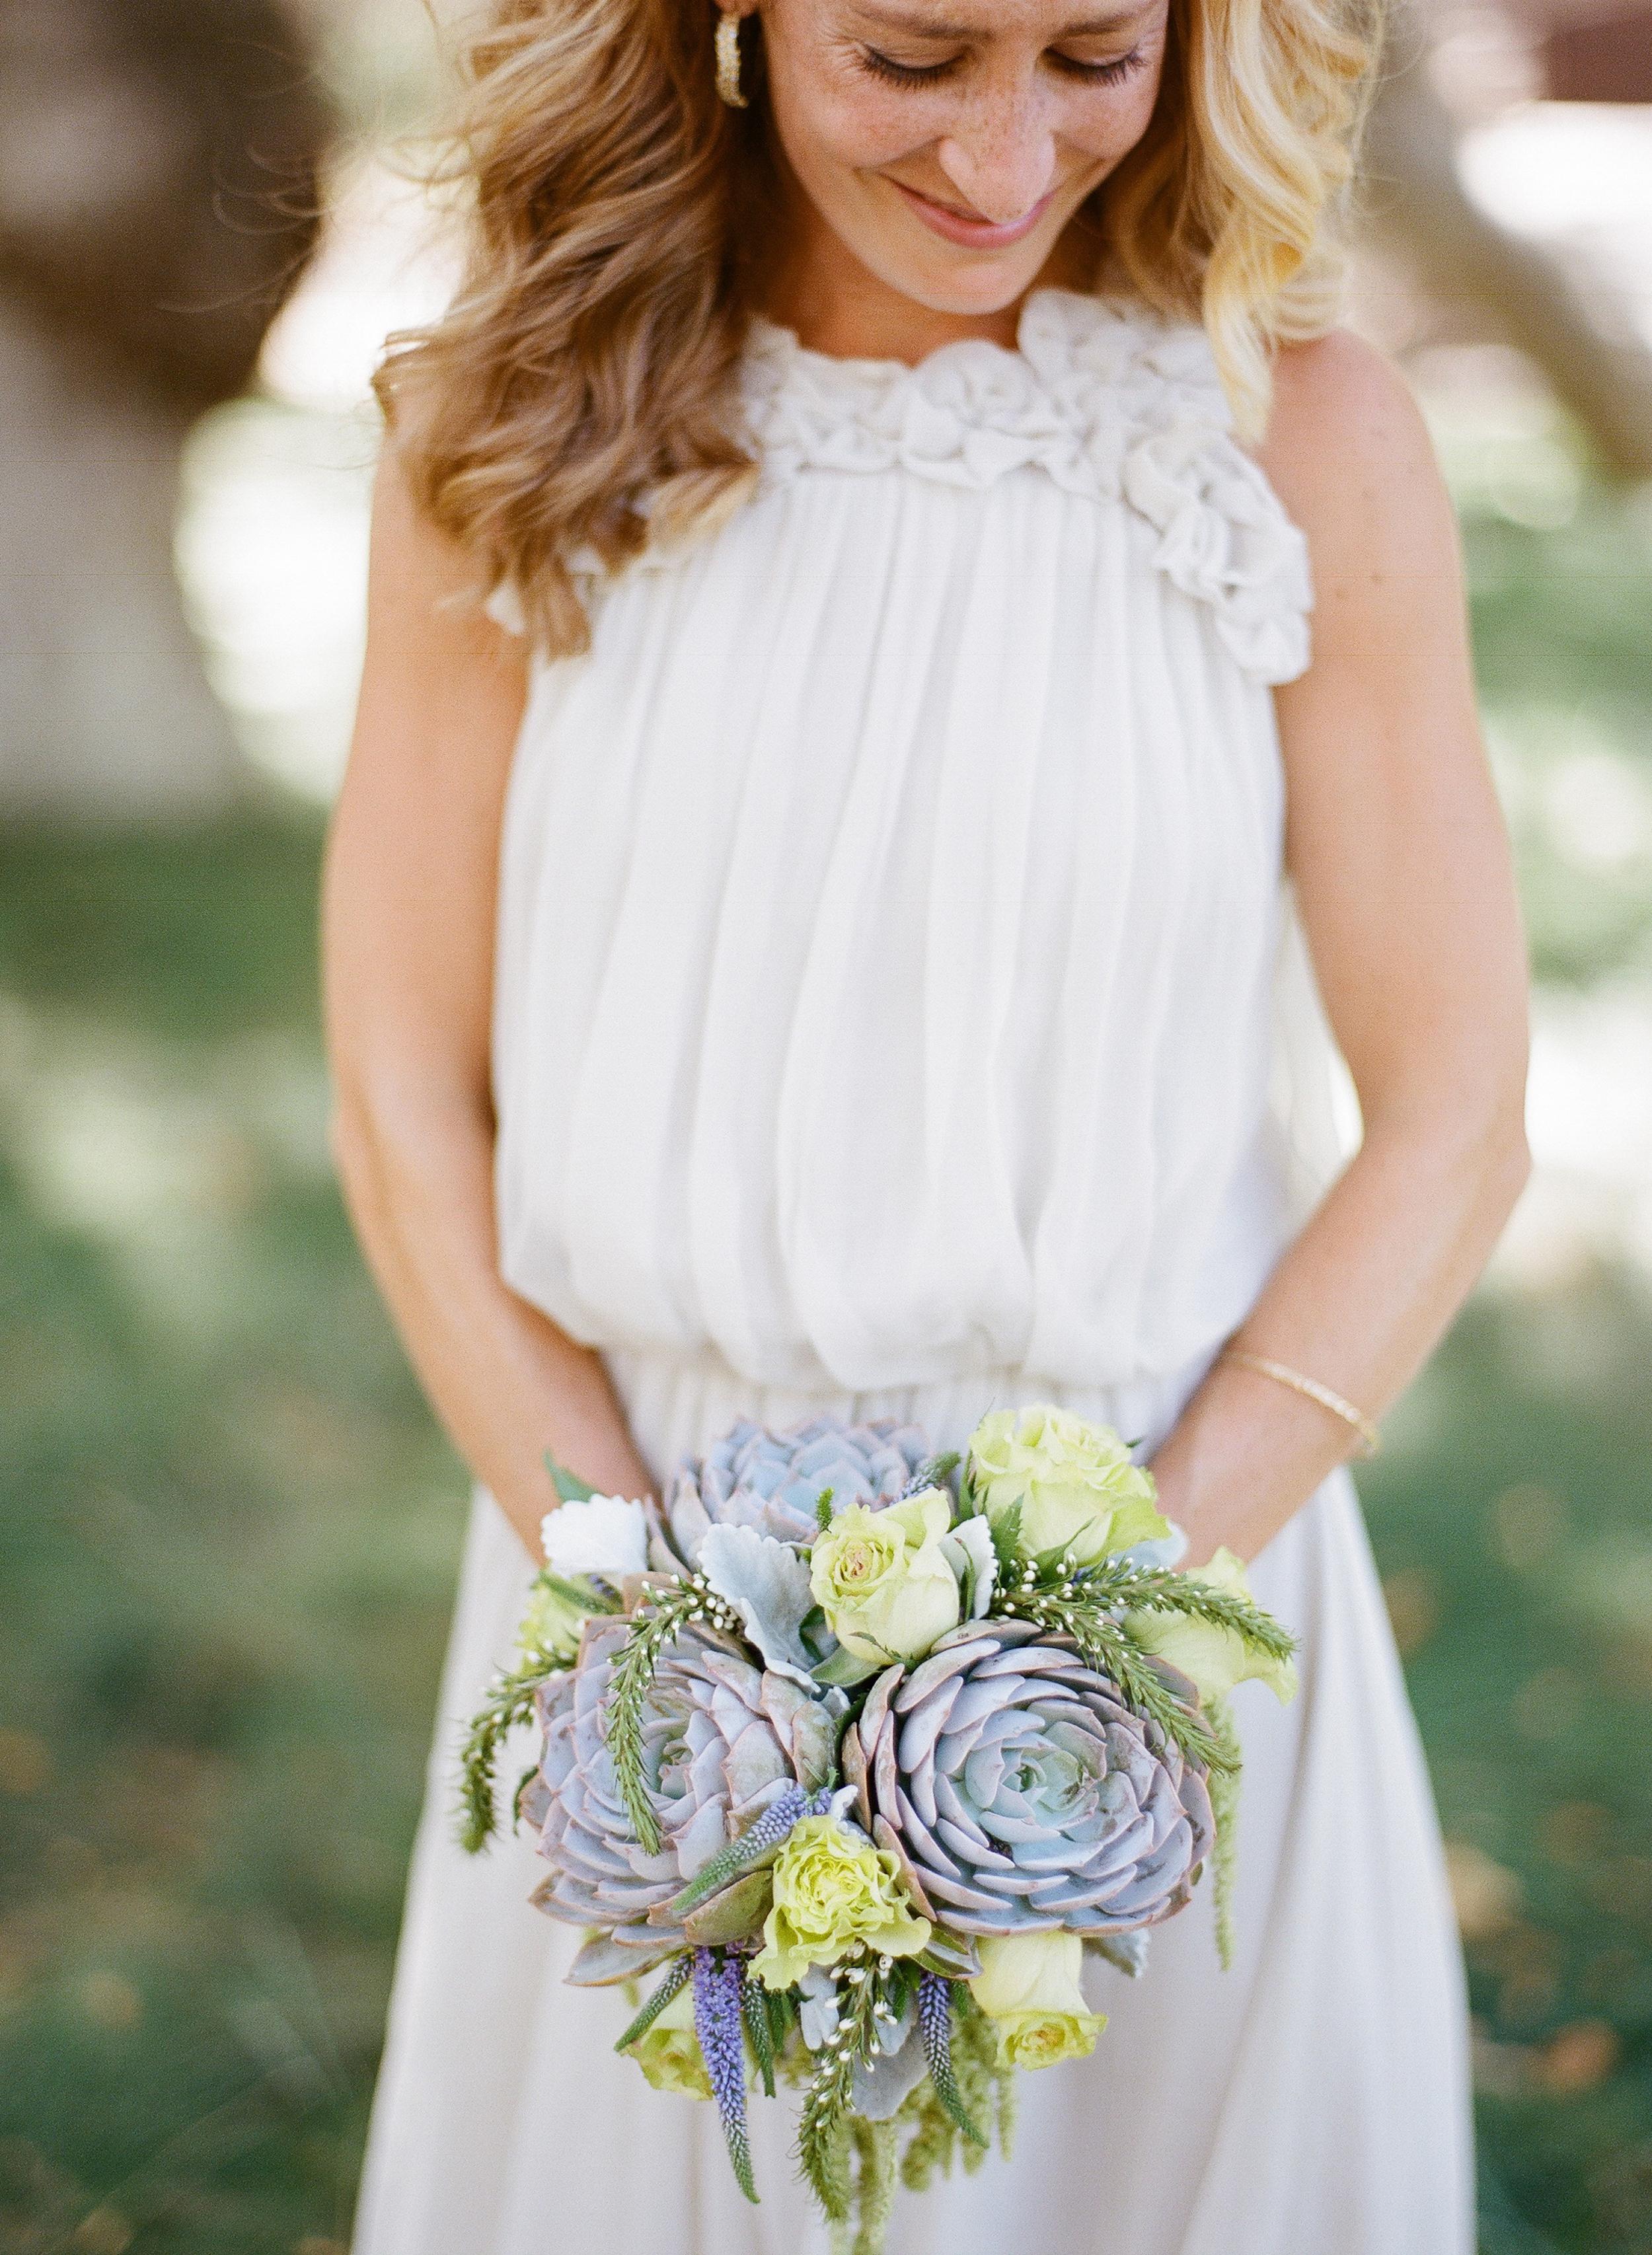 los-angeles-wedding-photographer-leila-brewster-0372.jpg